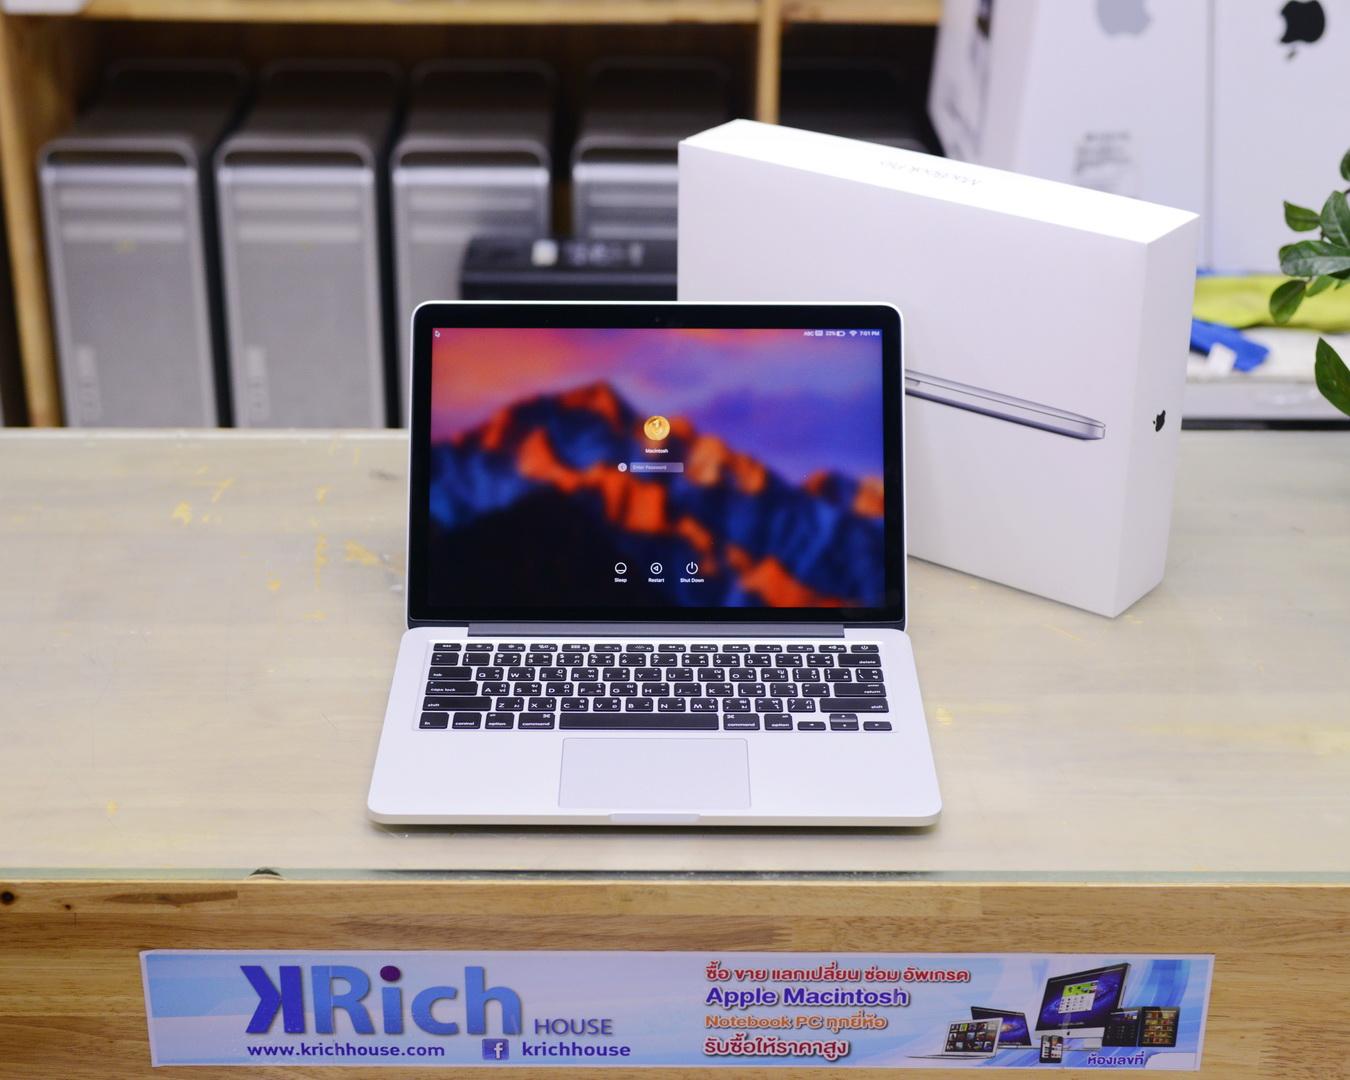 TOP MODEL - MacBook Pro (13-inch, Early 2015) - Core i5 2.9GHz RAM 8GB SSD 512GB - Fullbox